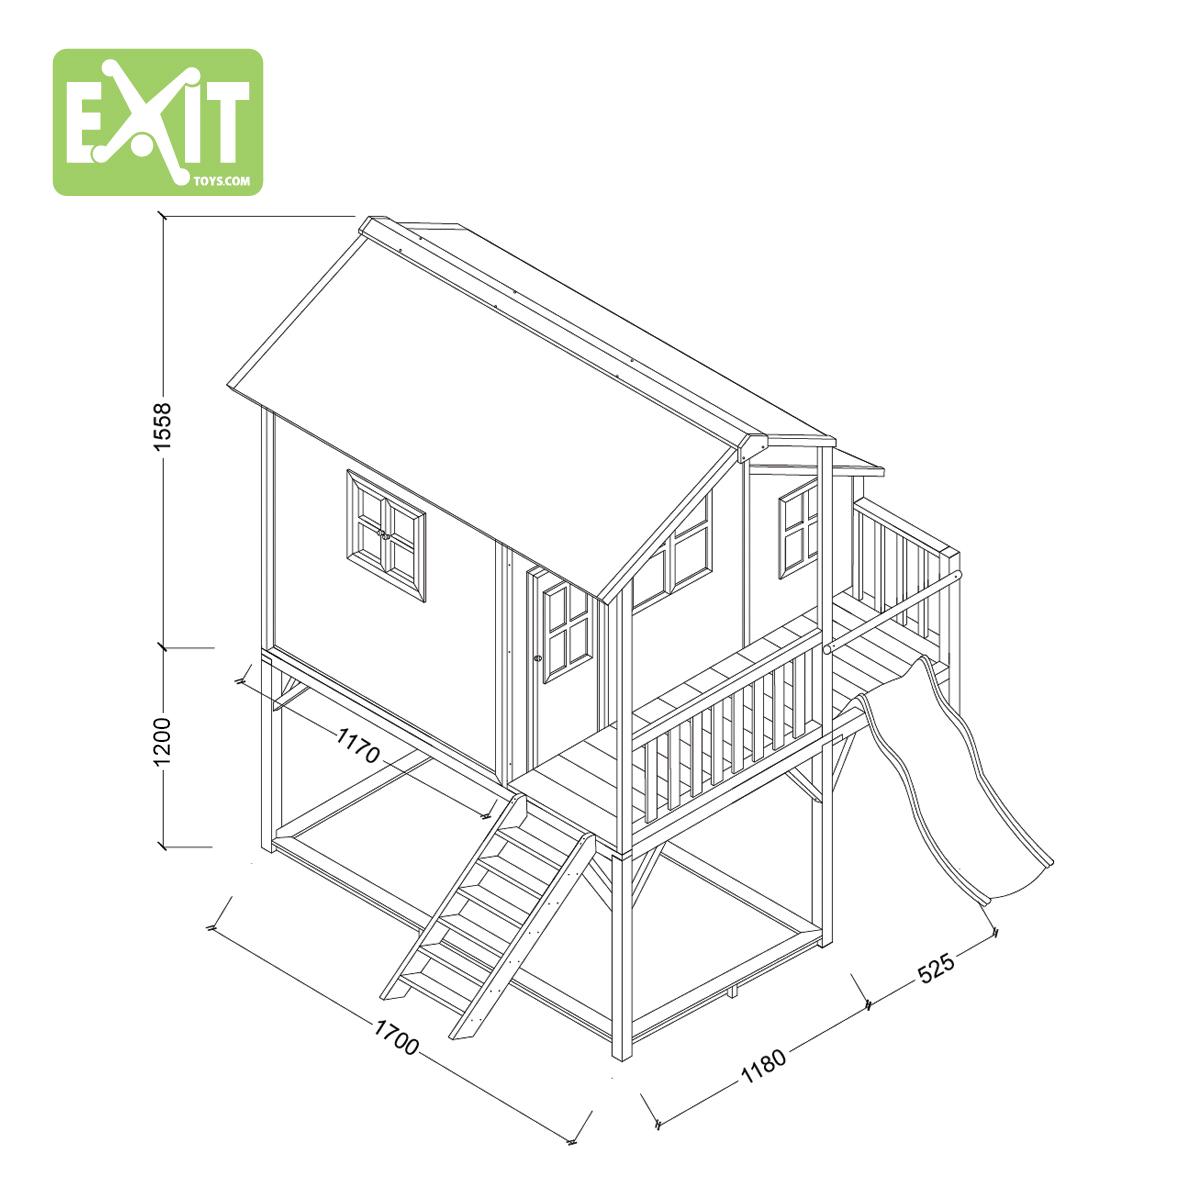 Loft 750  – Bild 5